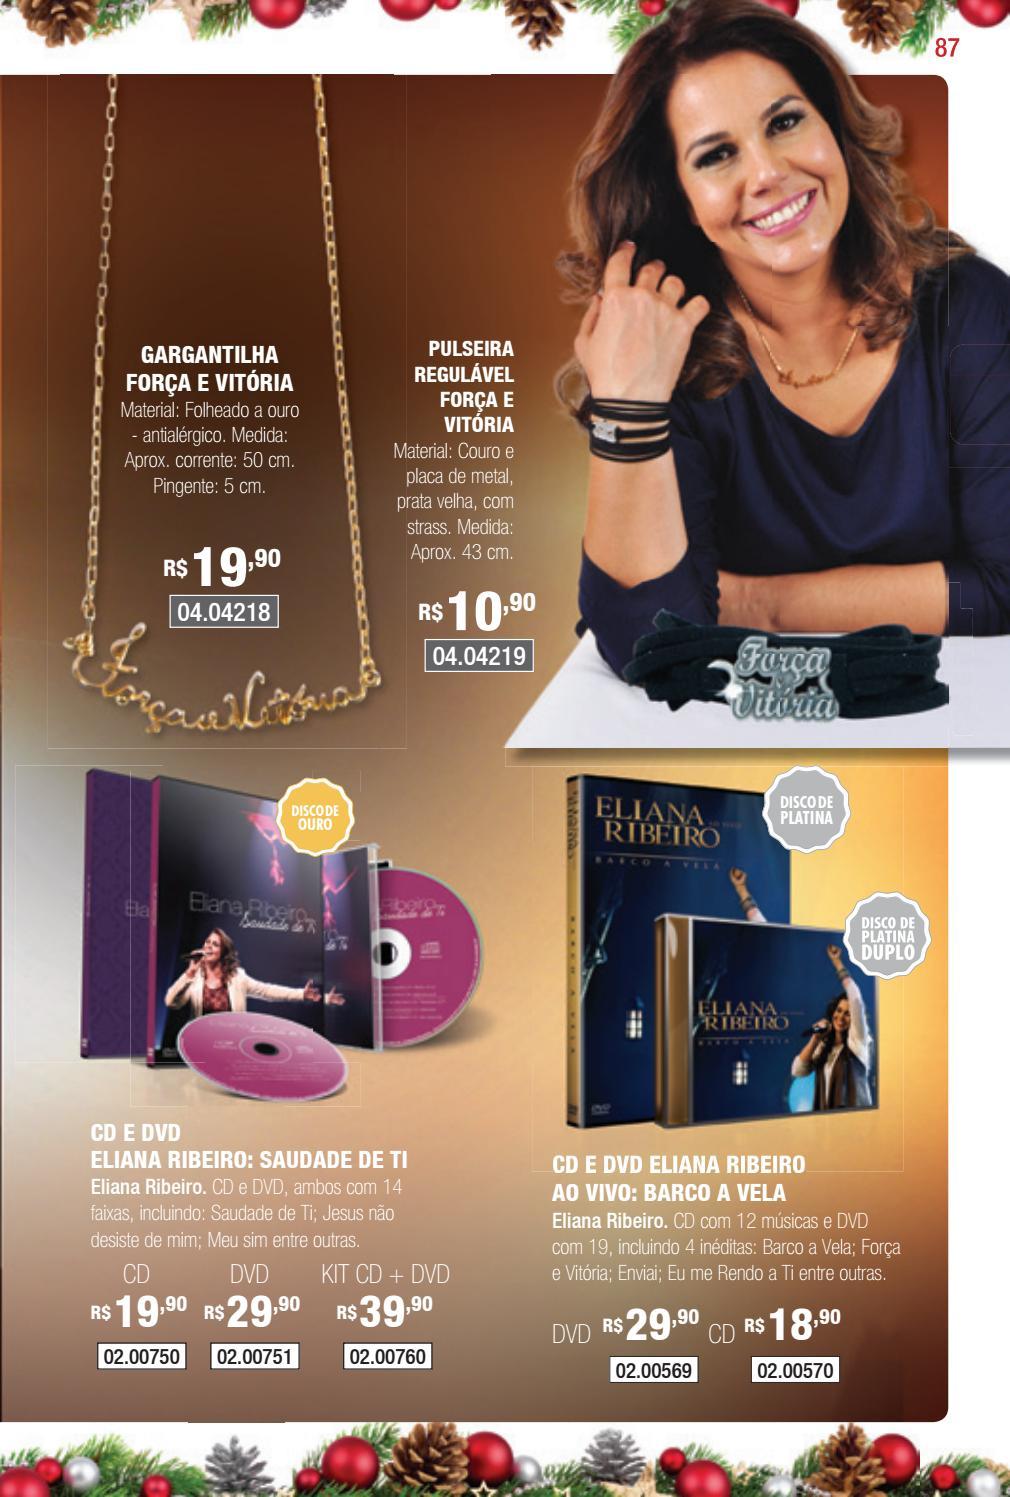 ELIANA VELA RIBEIRO A BAIXAR DE MUSICAS BARCO DO CD